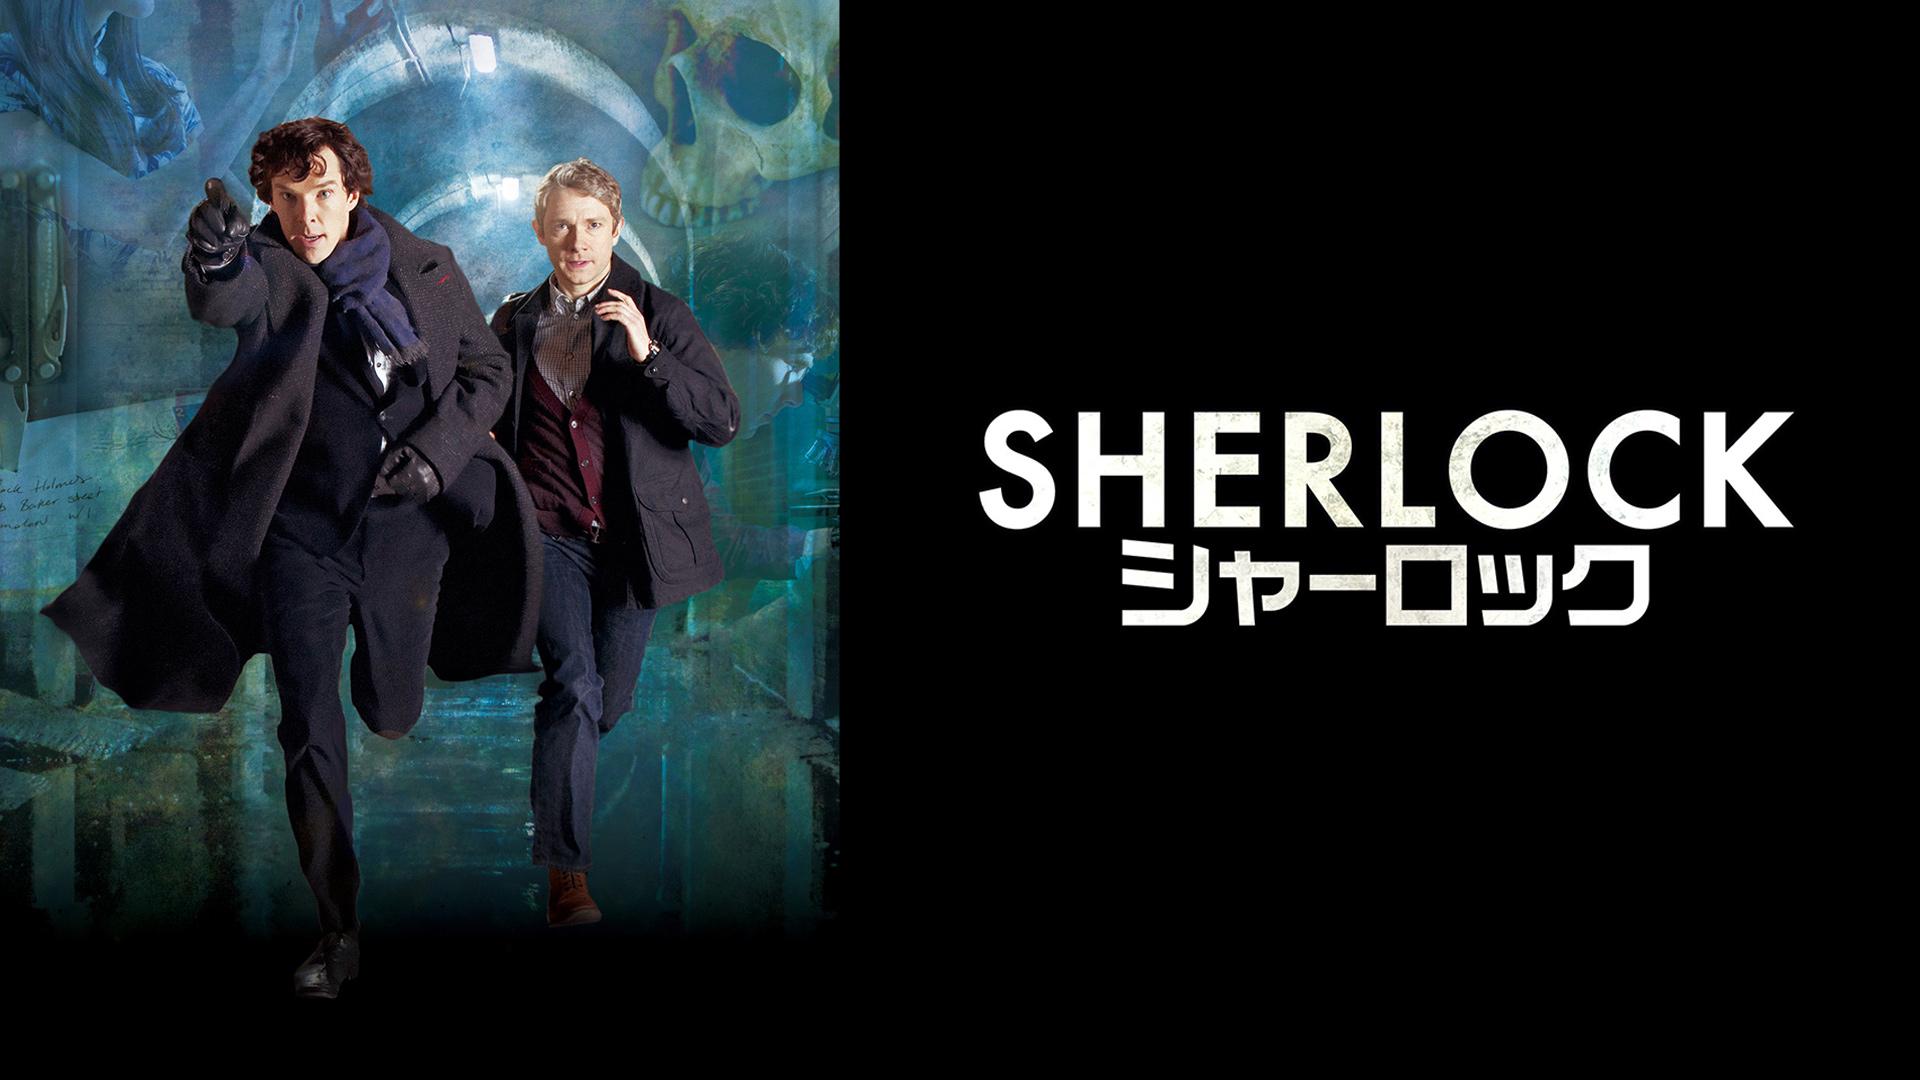 SHERLOCK/シャーロック シーズン1(吹替版)